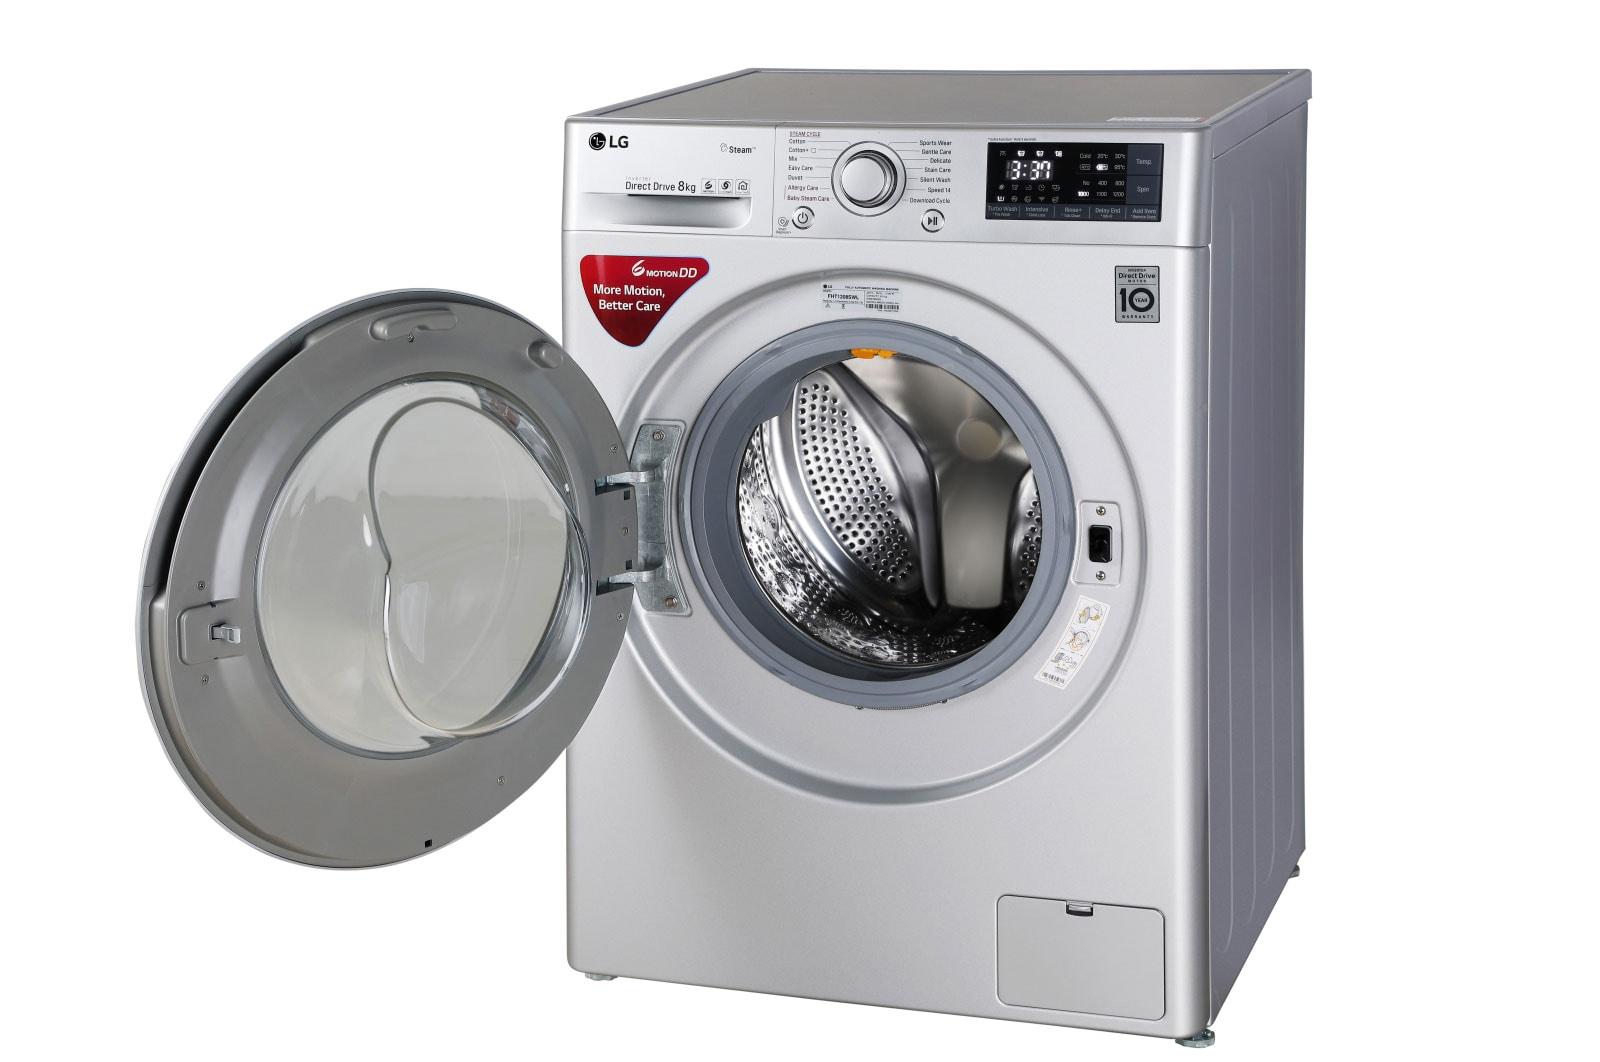 Lg 80 Kg Washing Machine With Steam Turbowash Technology India North Star Cleaner Wiring Diagram